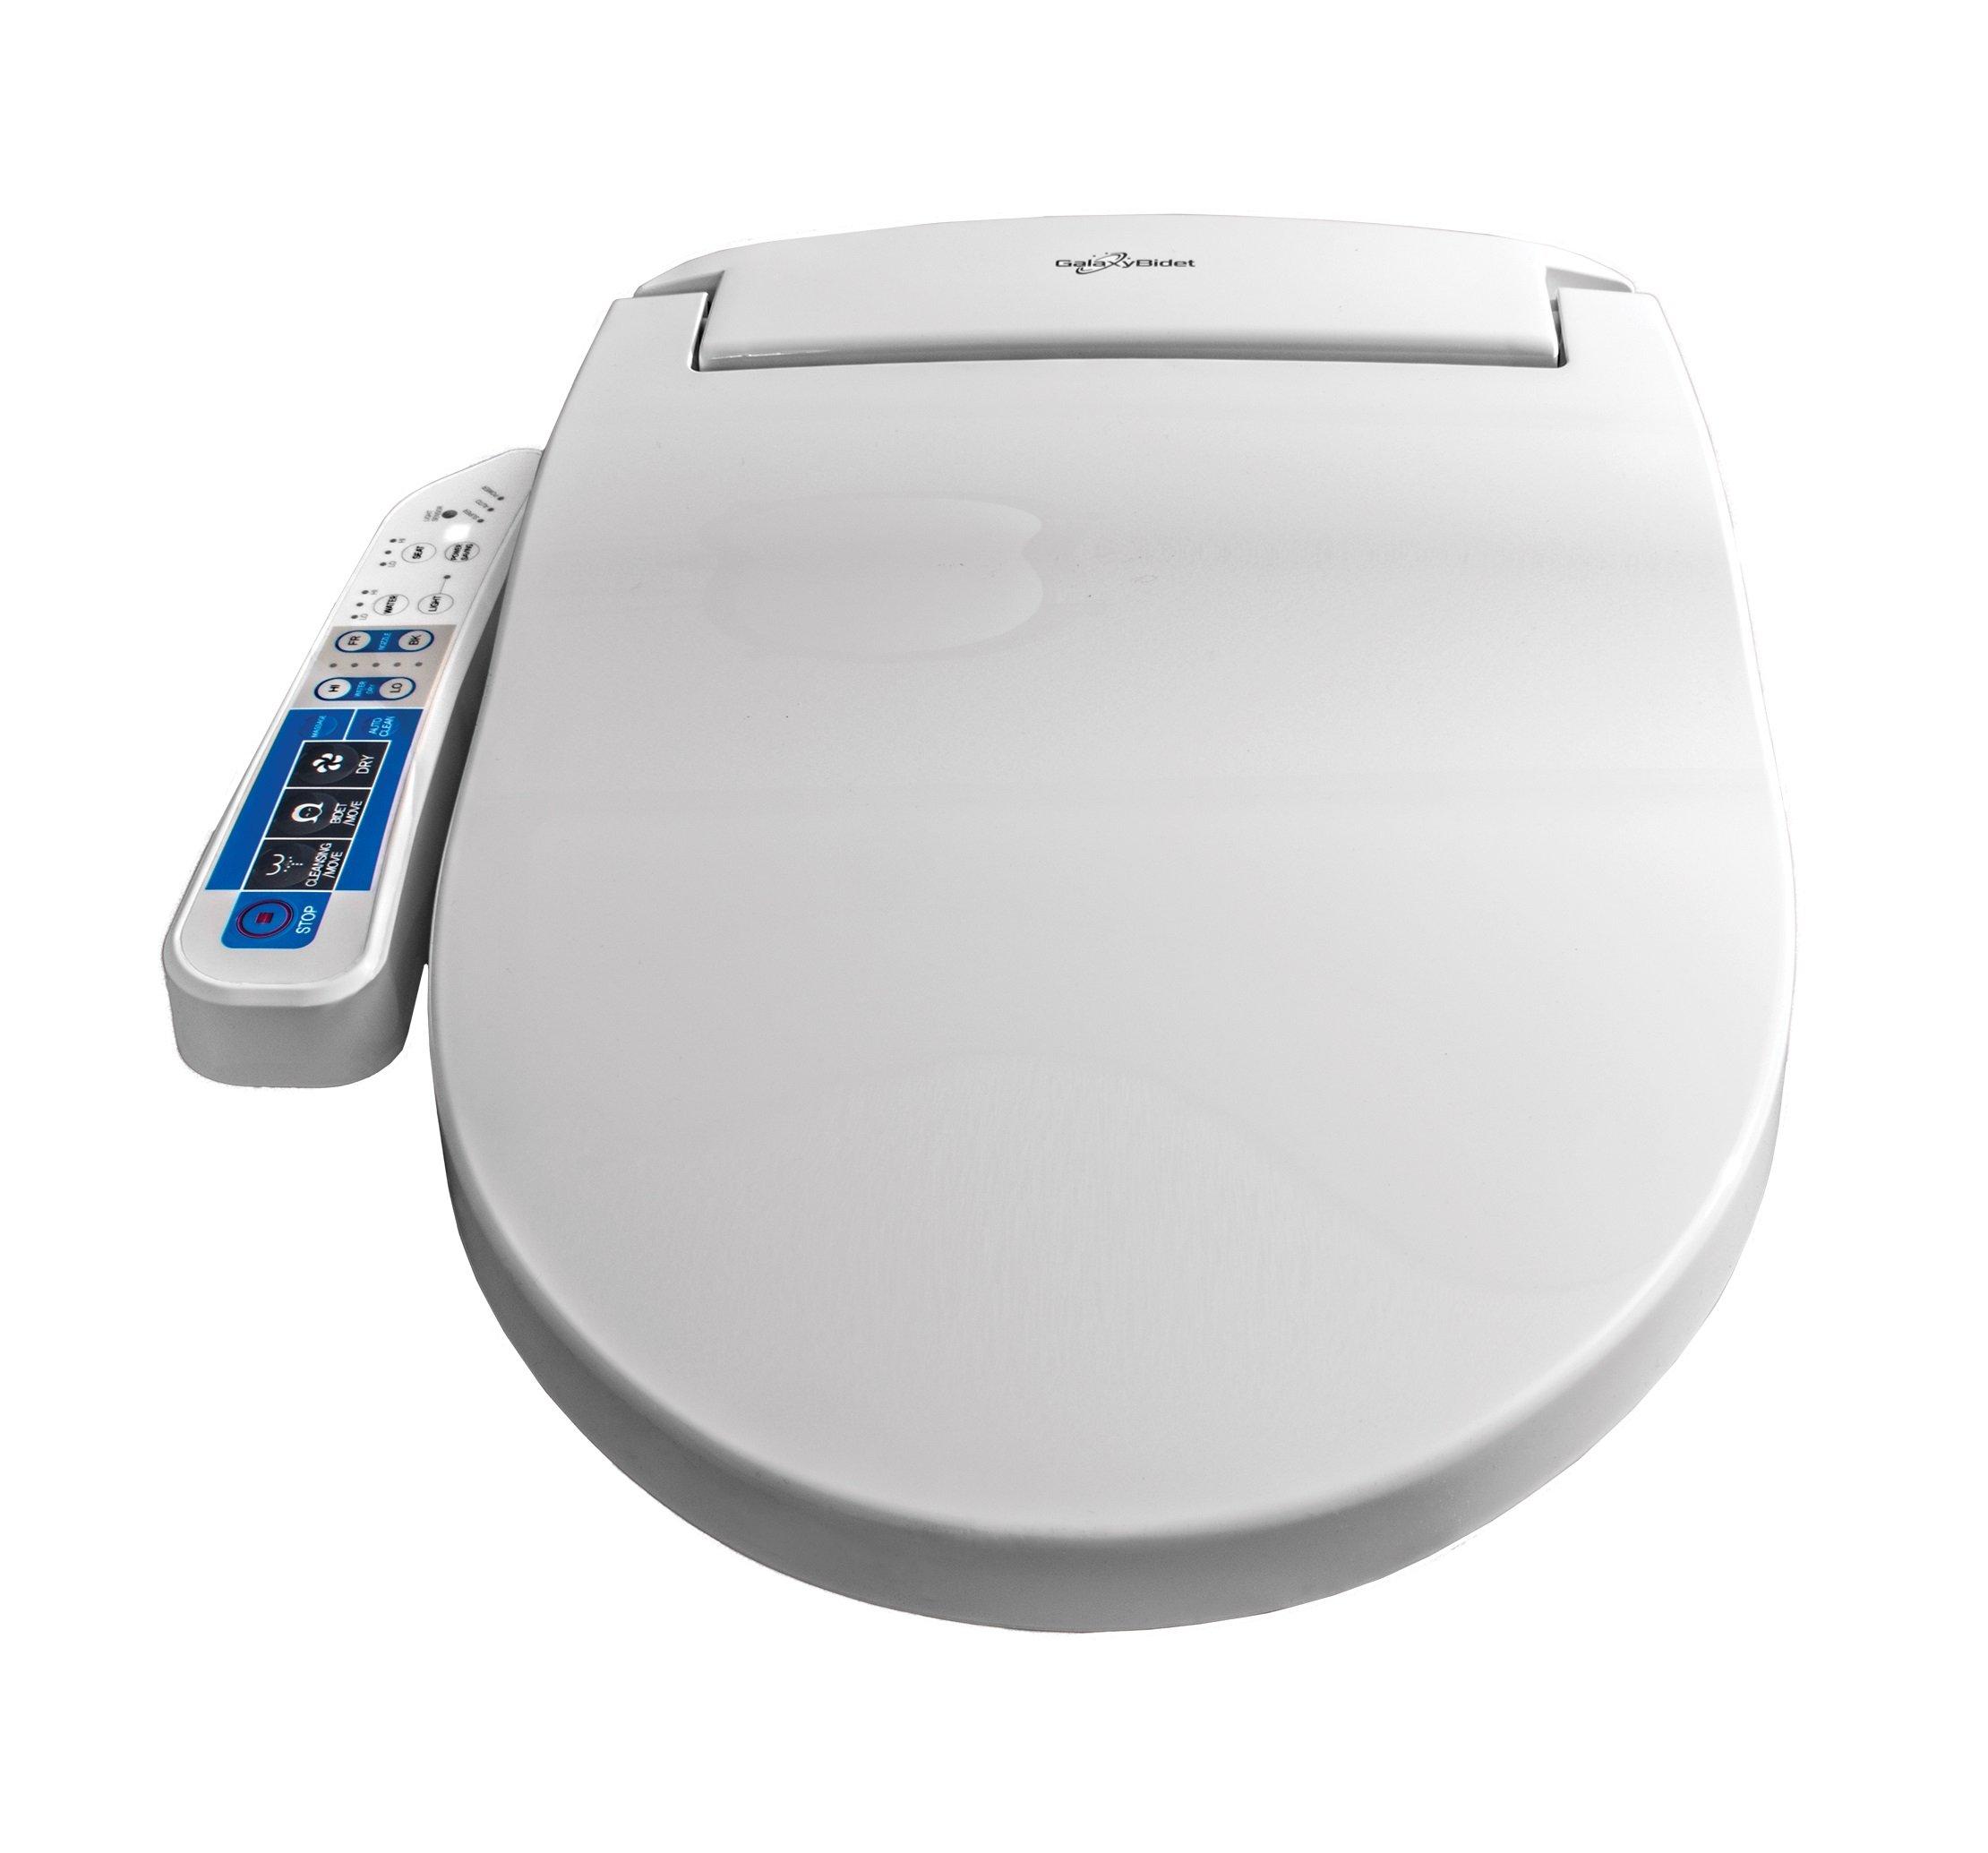 Galaxy Bidet Electronic W18.2 x D19.5 x H6.1 Inches Toilet Seat by Galaxy Bidet (Image #4)